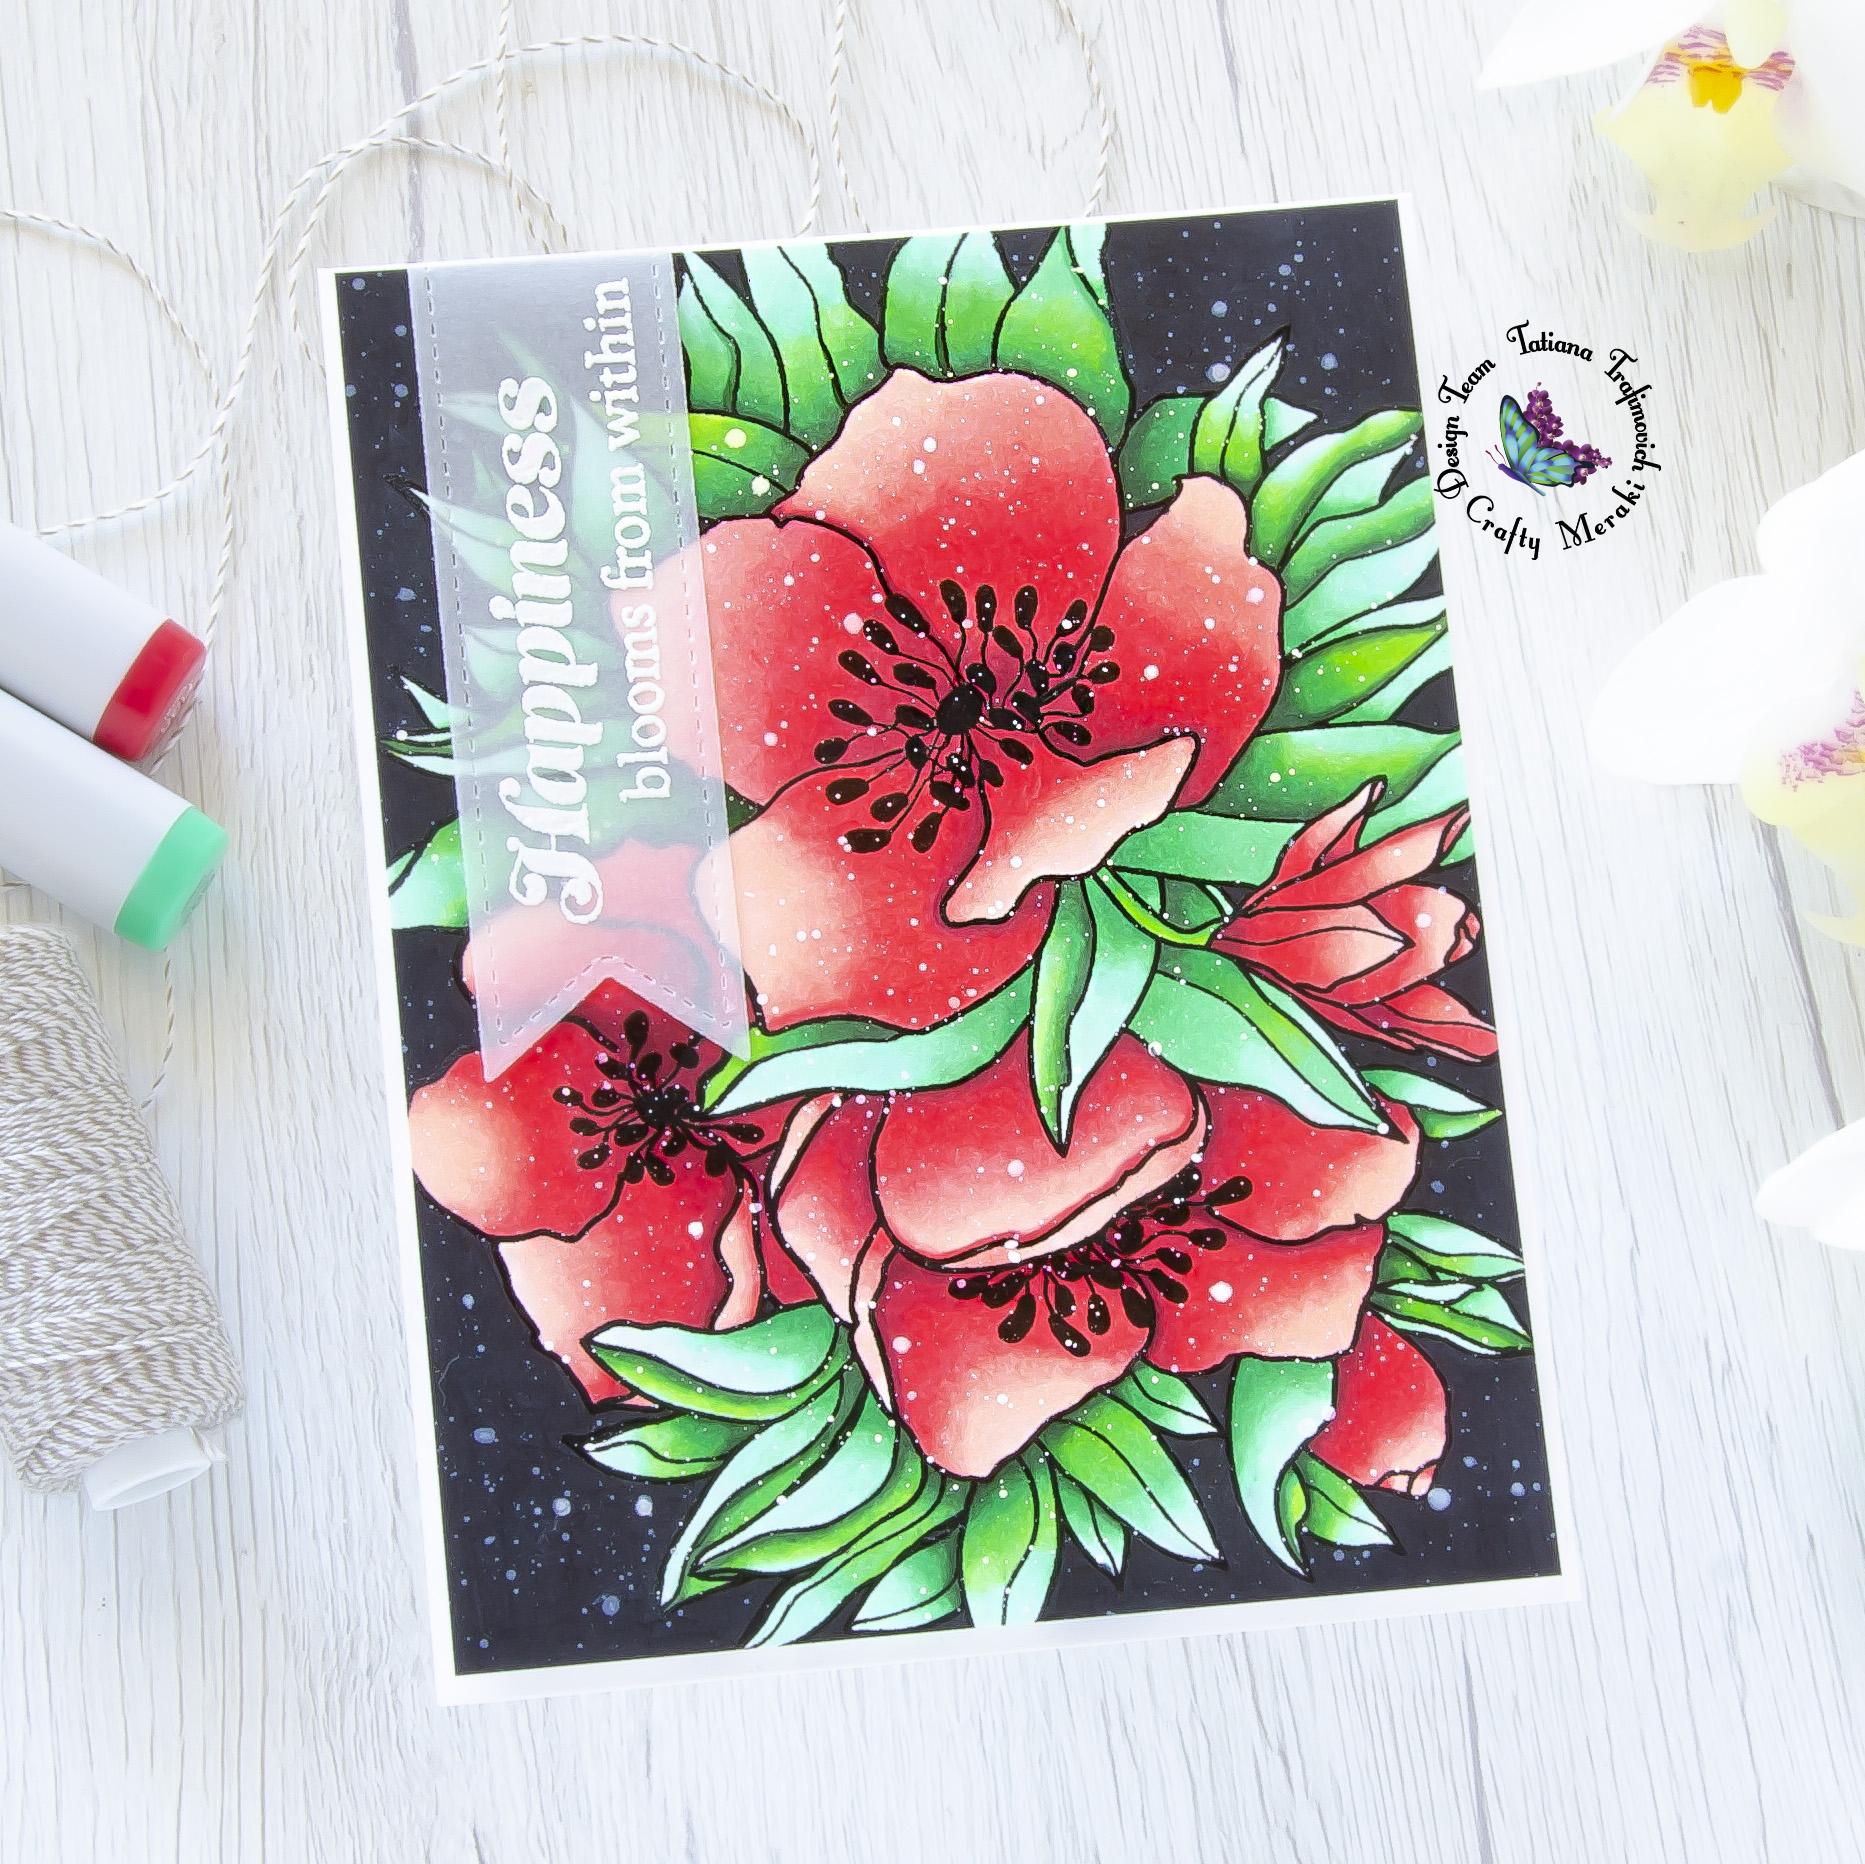 Happiness Blooms From Within #handmade card by Tatiana Trafimovich #tatianacraftandart - Elegance stamp set by Crafty Meraki #craftymeraki